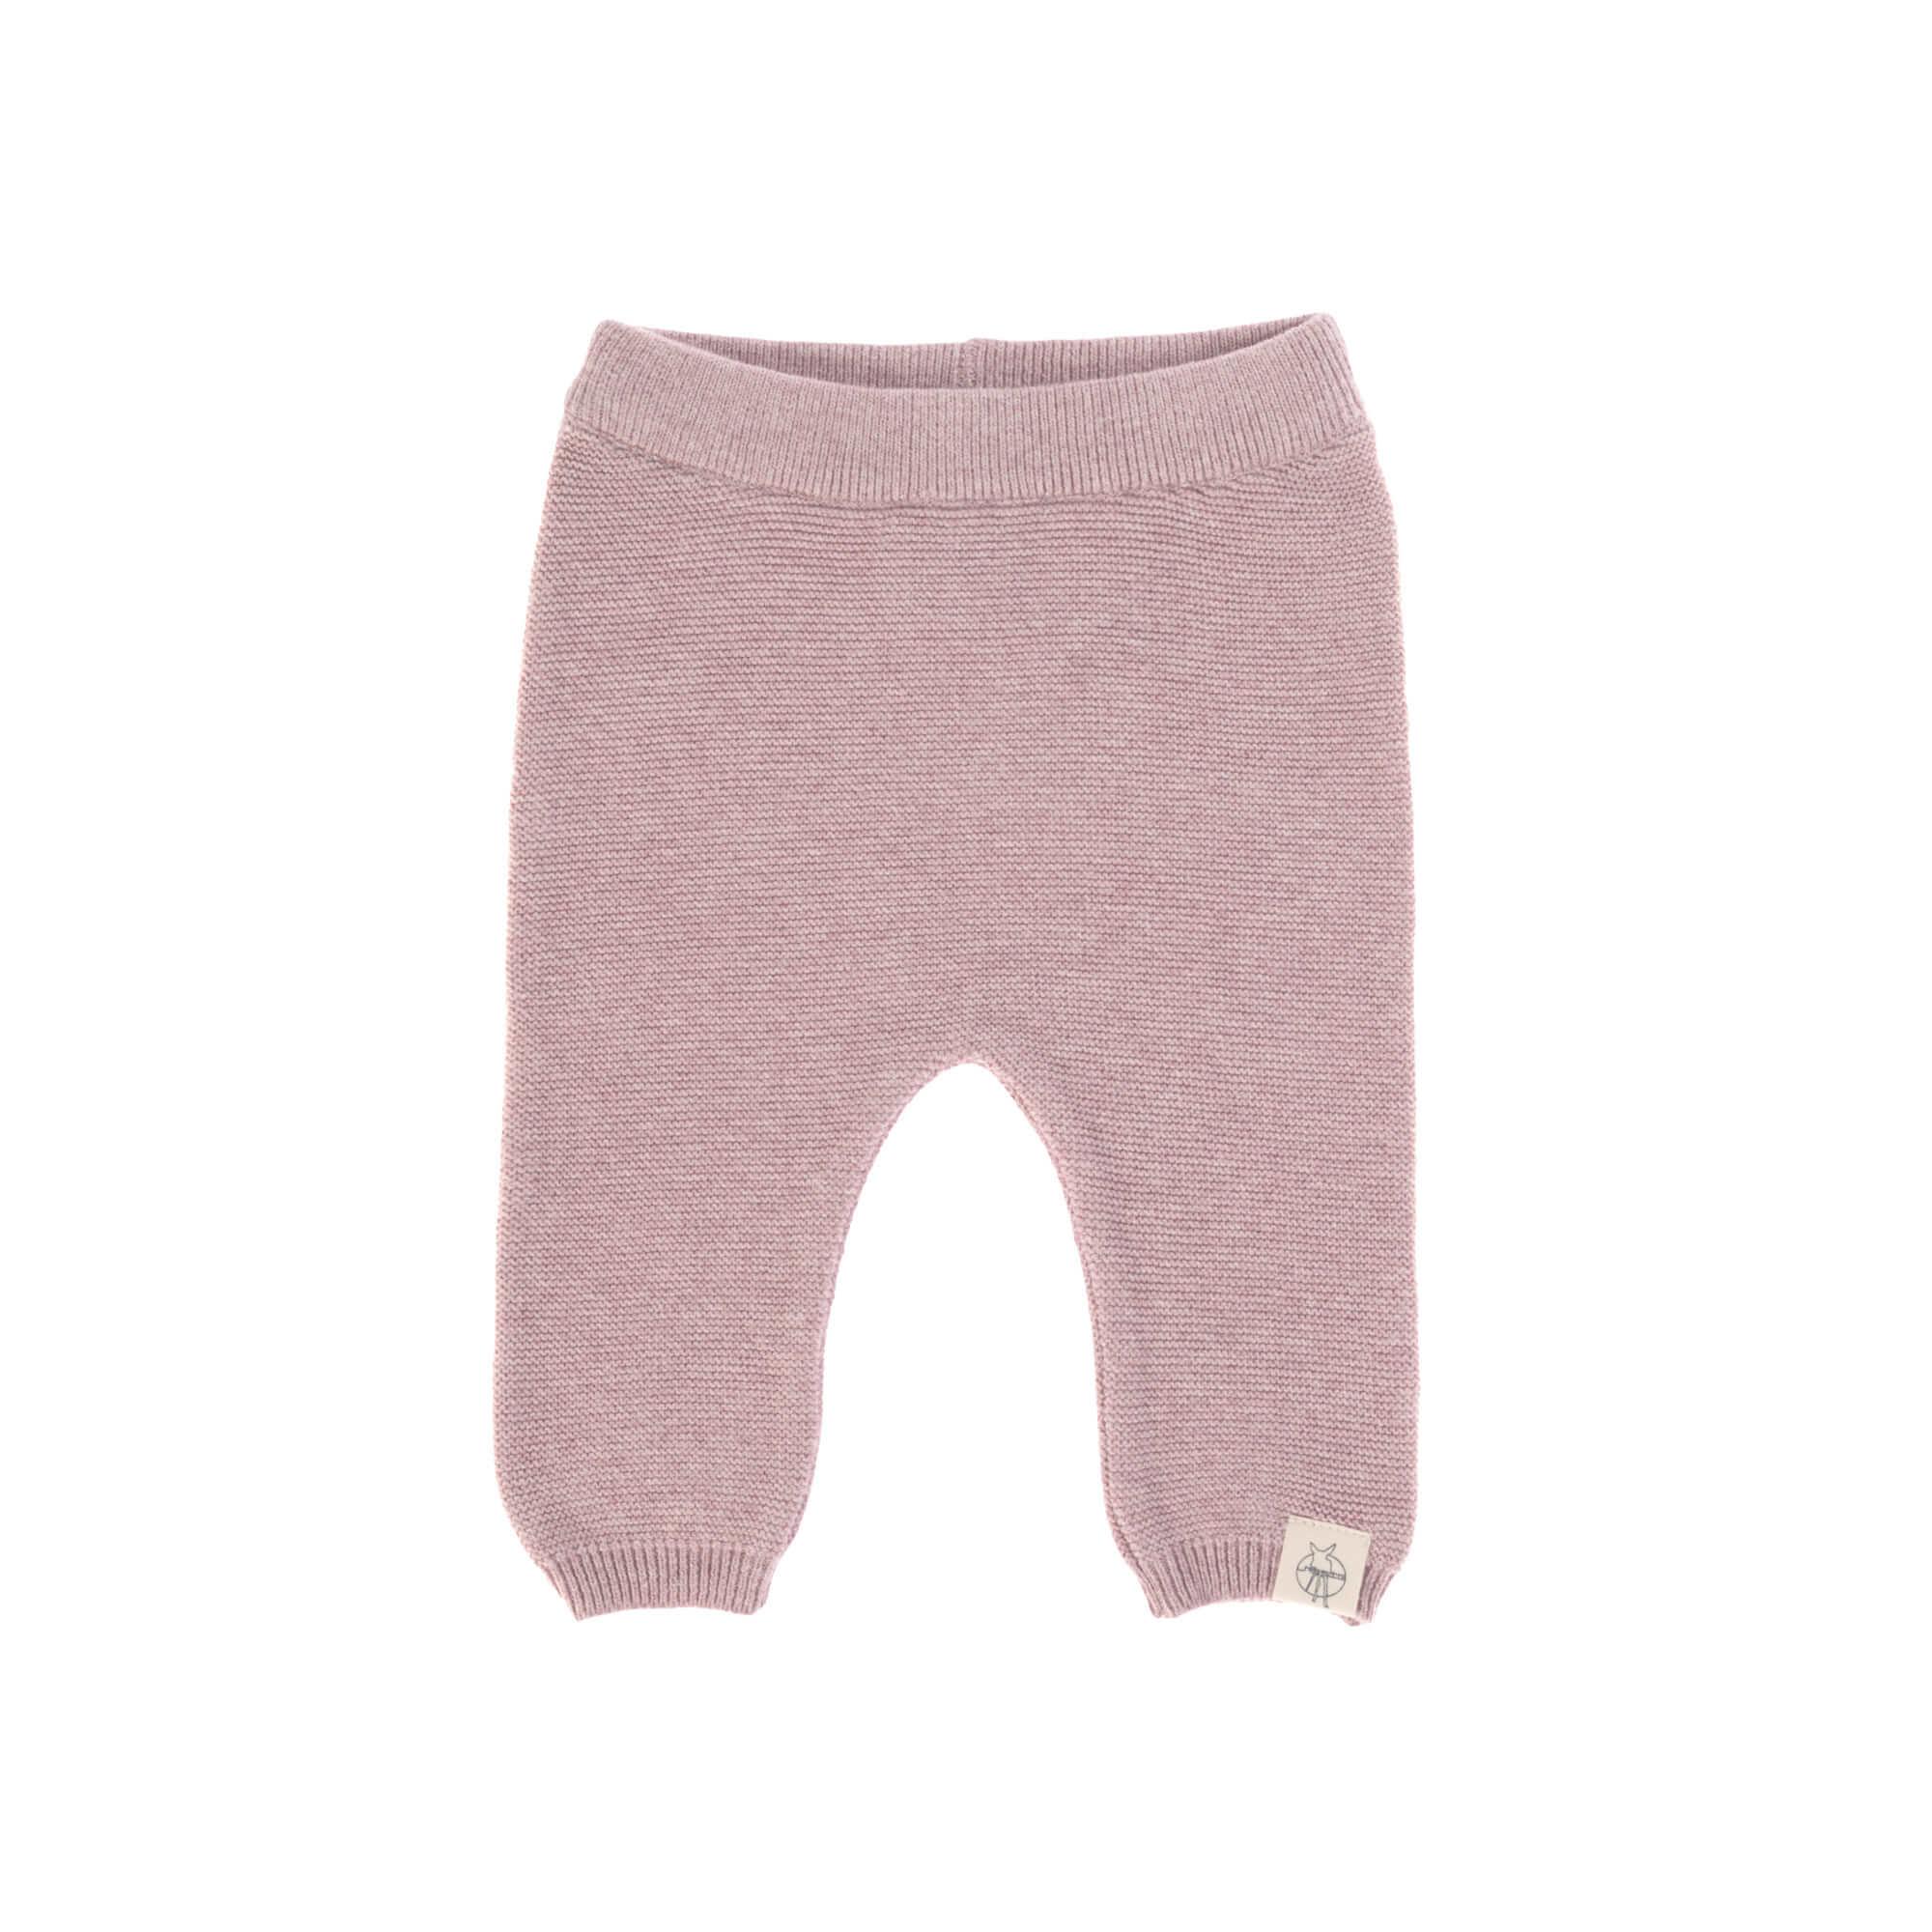 Baby Hose - Garden Explorer Light Pink - Lässig